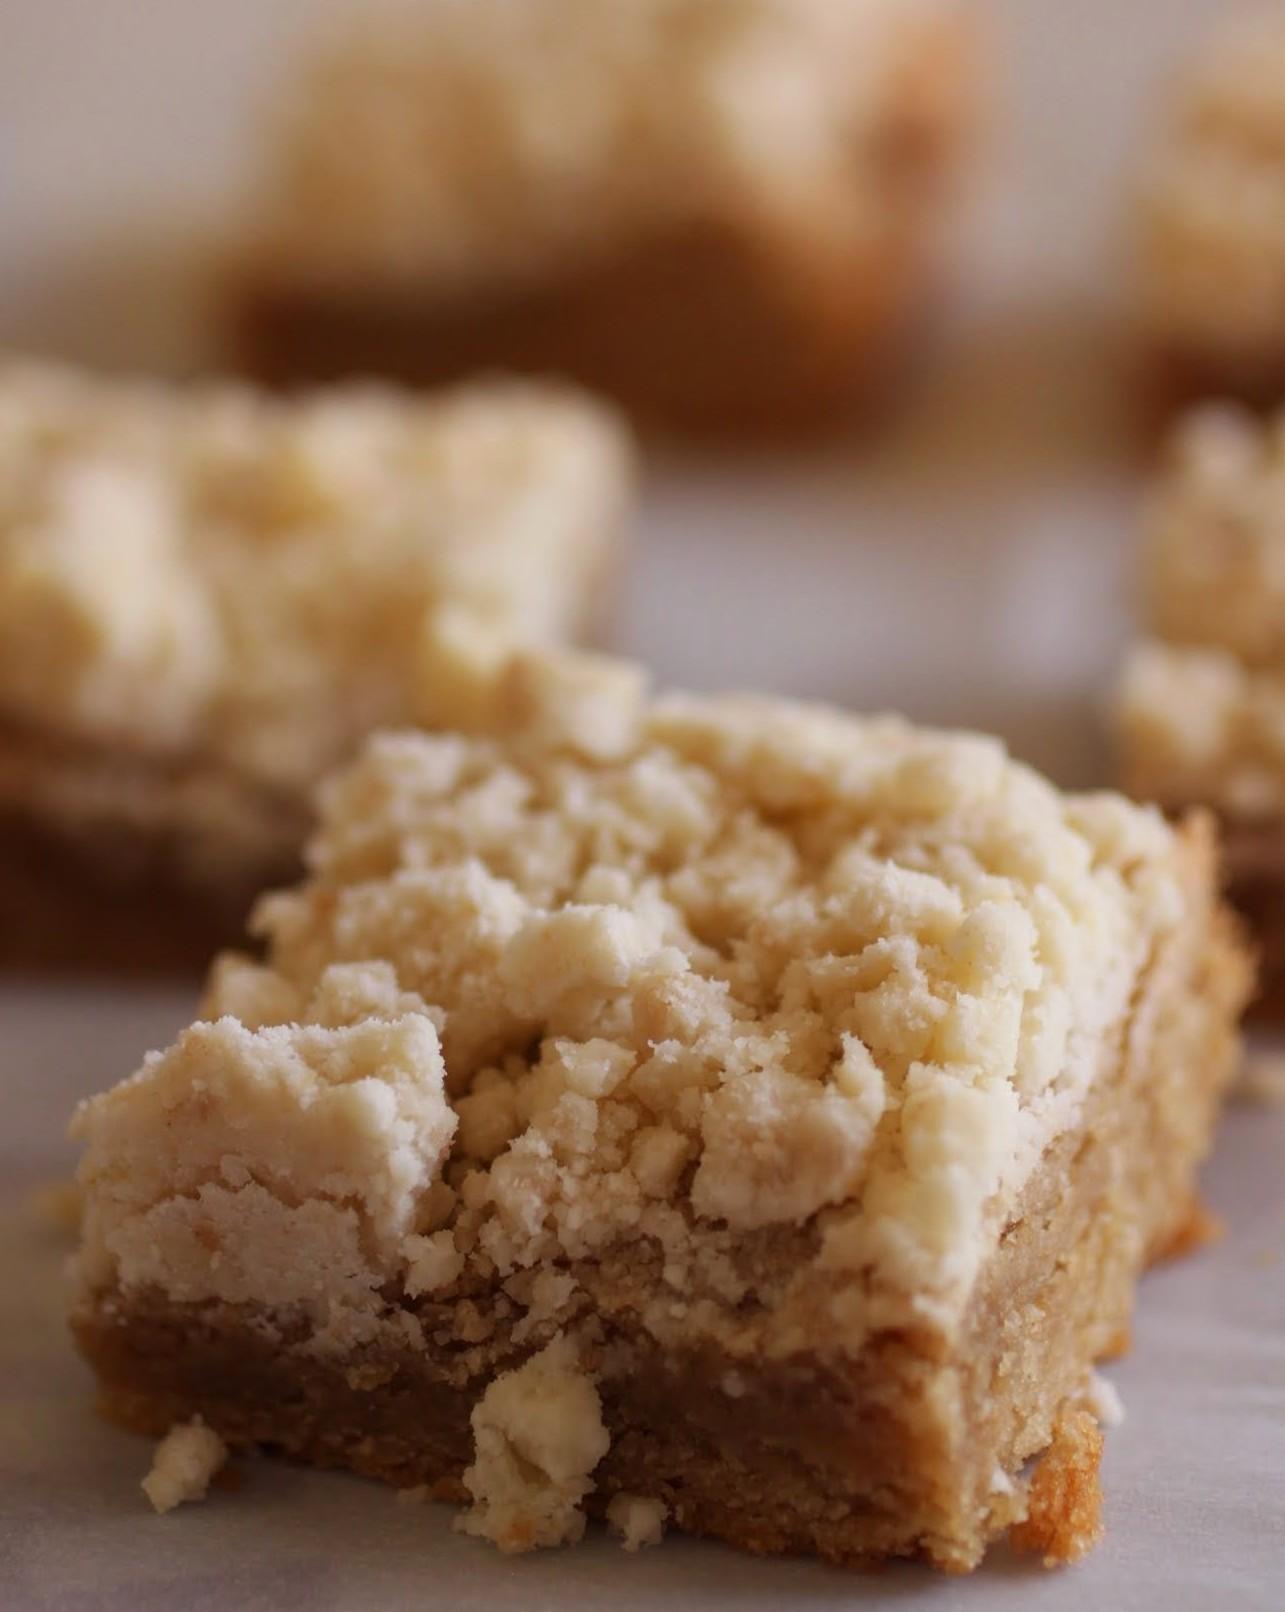 Peanut Butter Crumb Bars